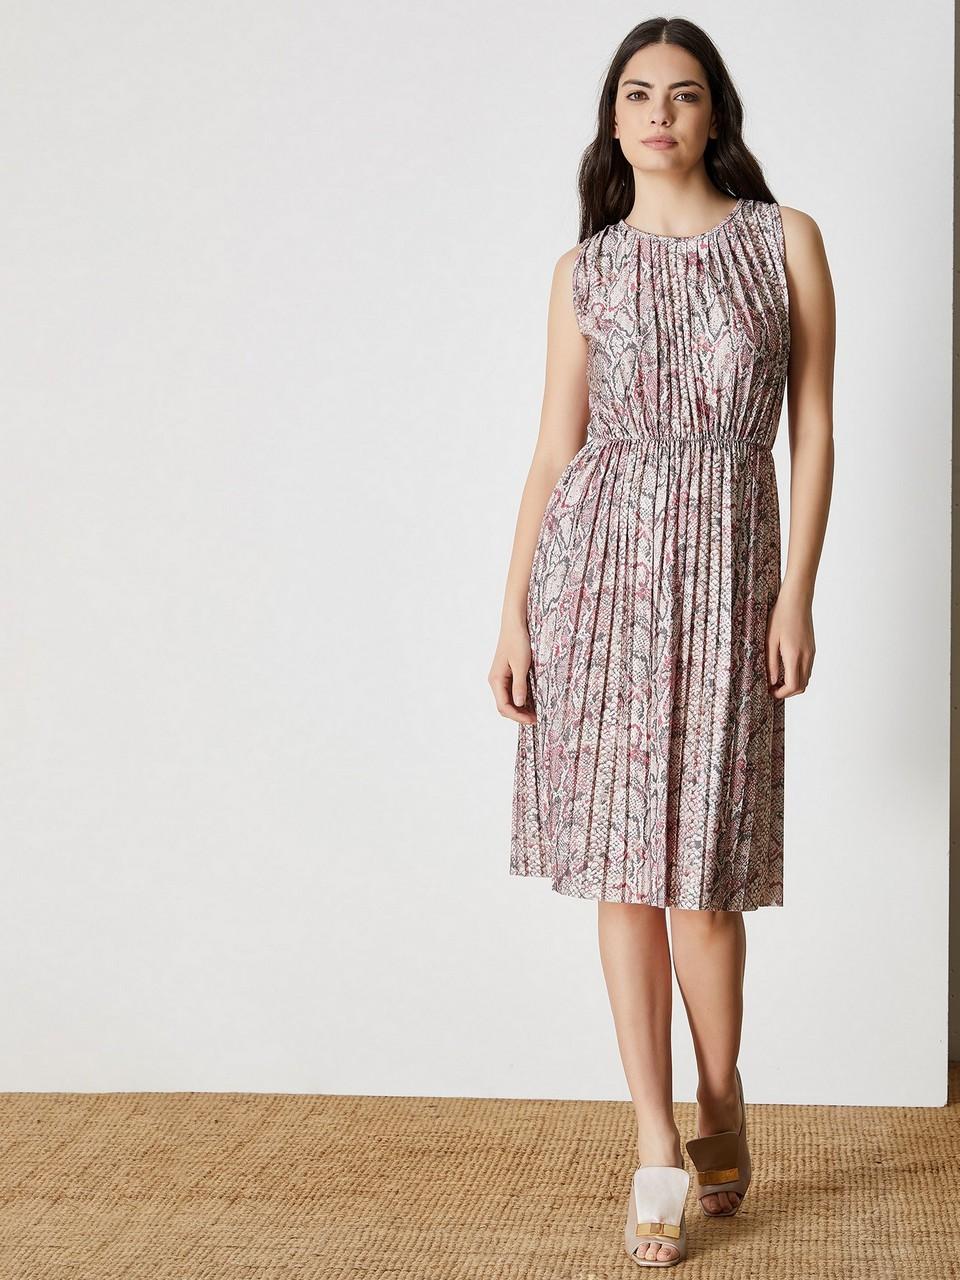 Piton Baskılı Pliseli Midi Elbise